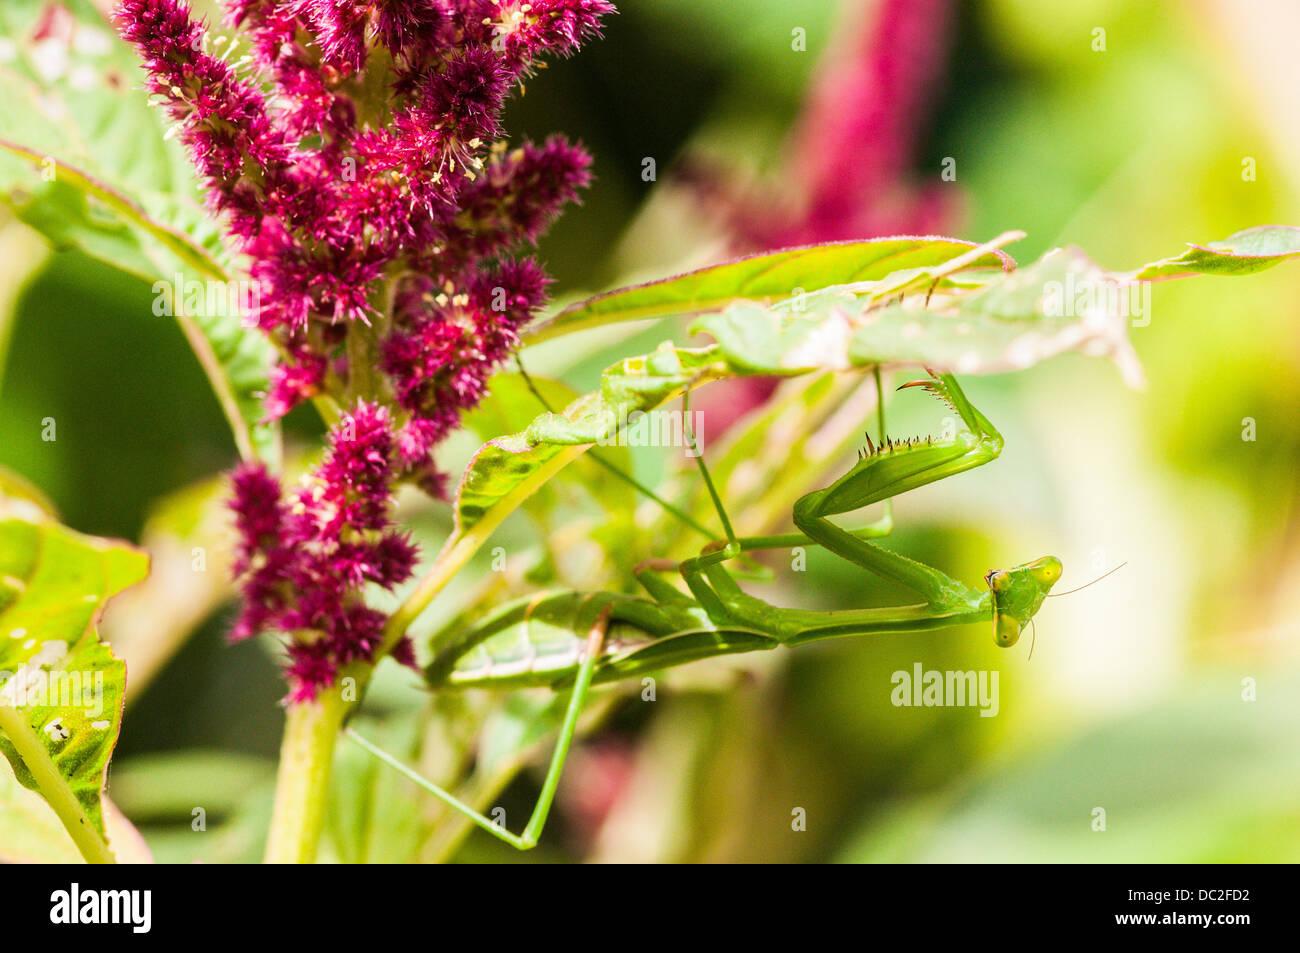 Preying Mantis on Amaranths, Brisbane, Queensland, Australia - Stock Image